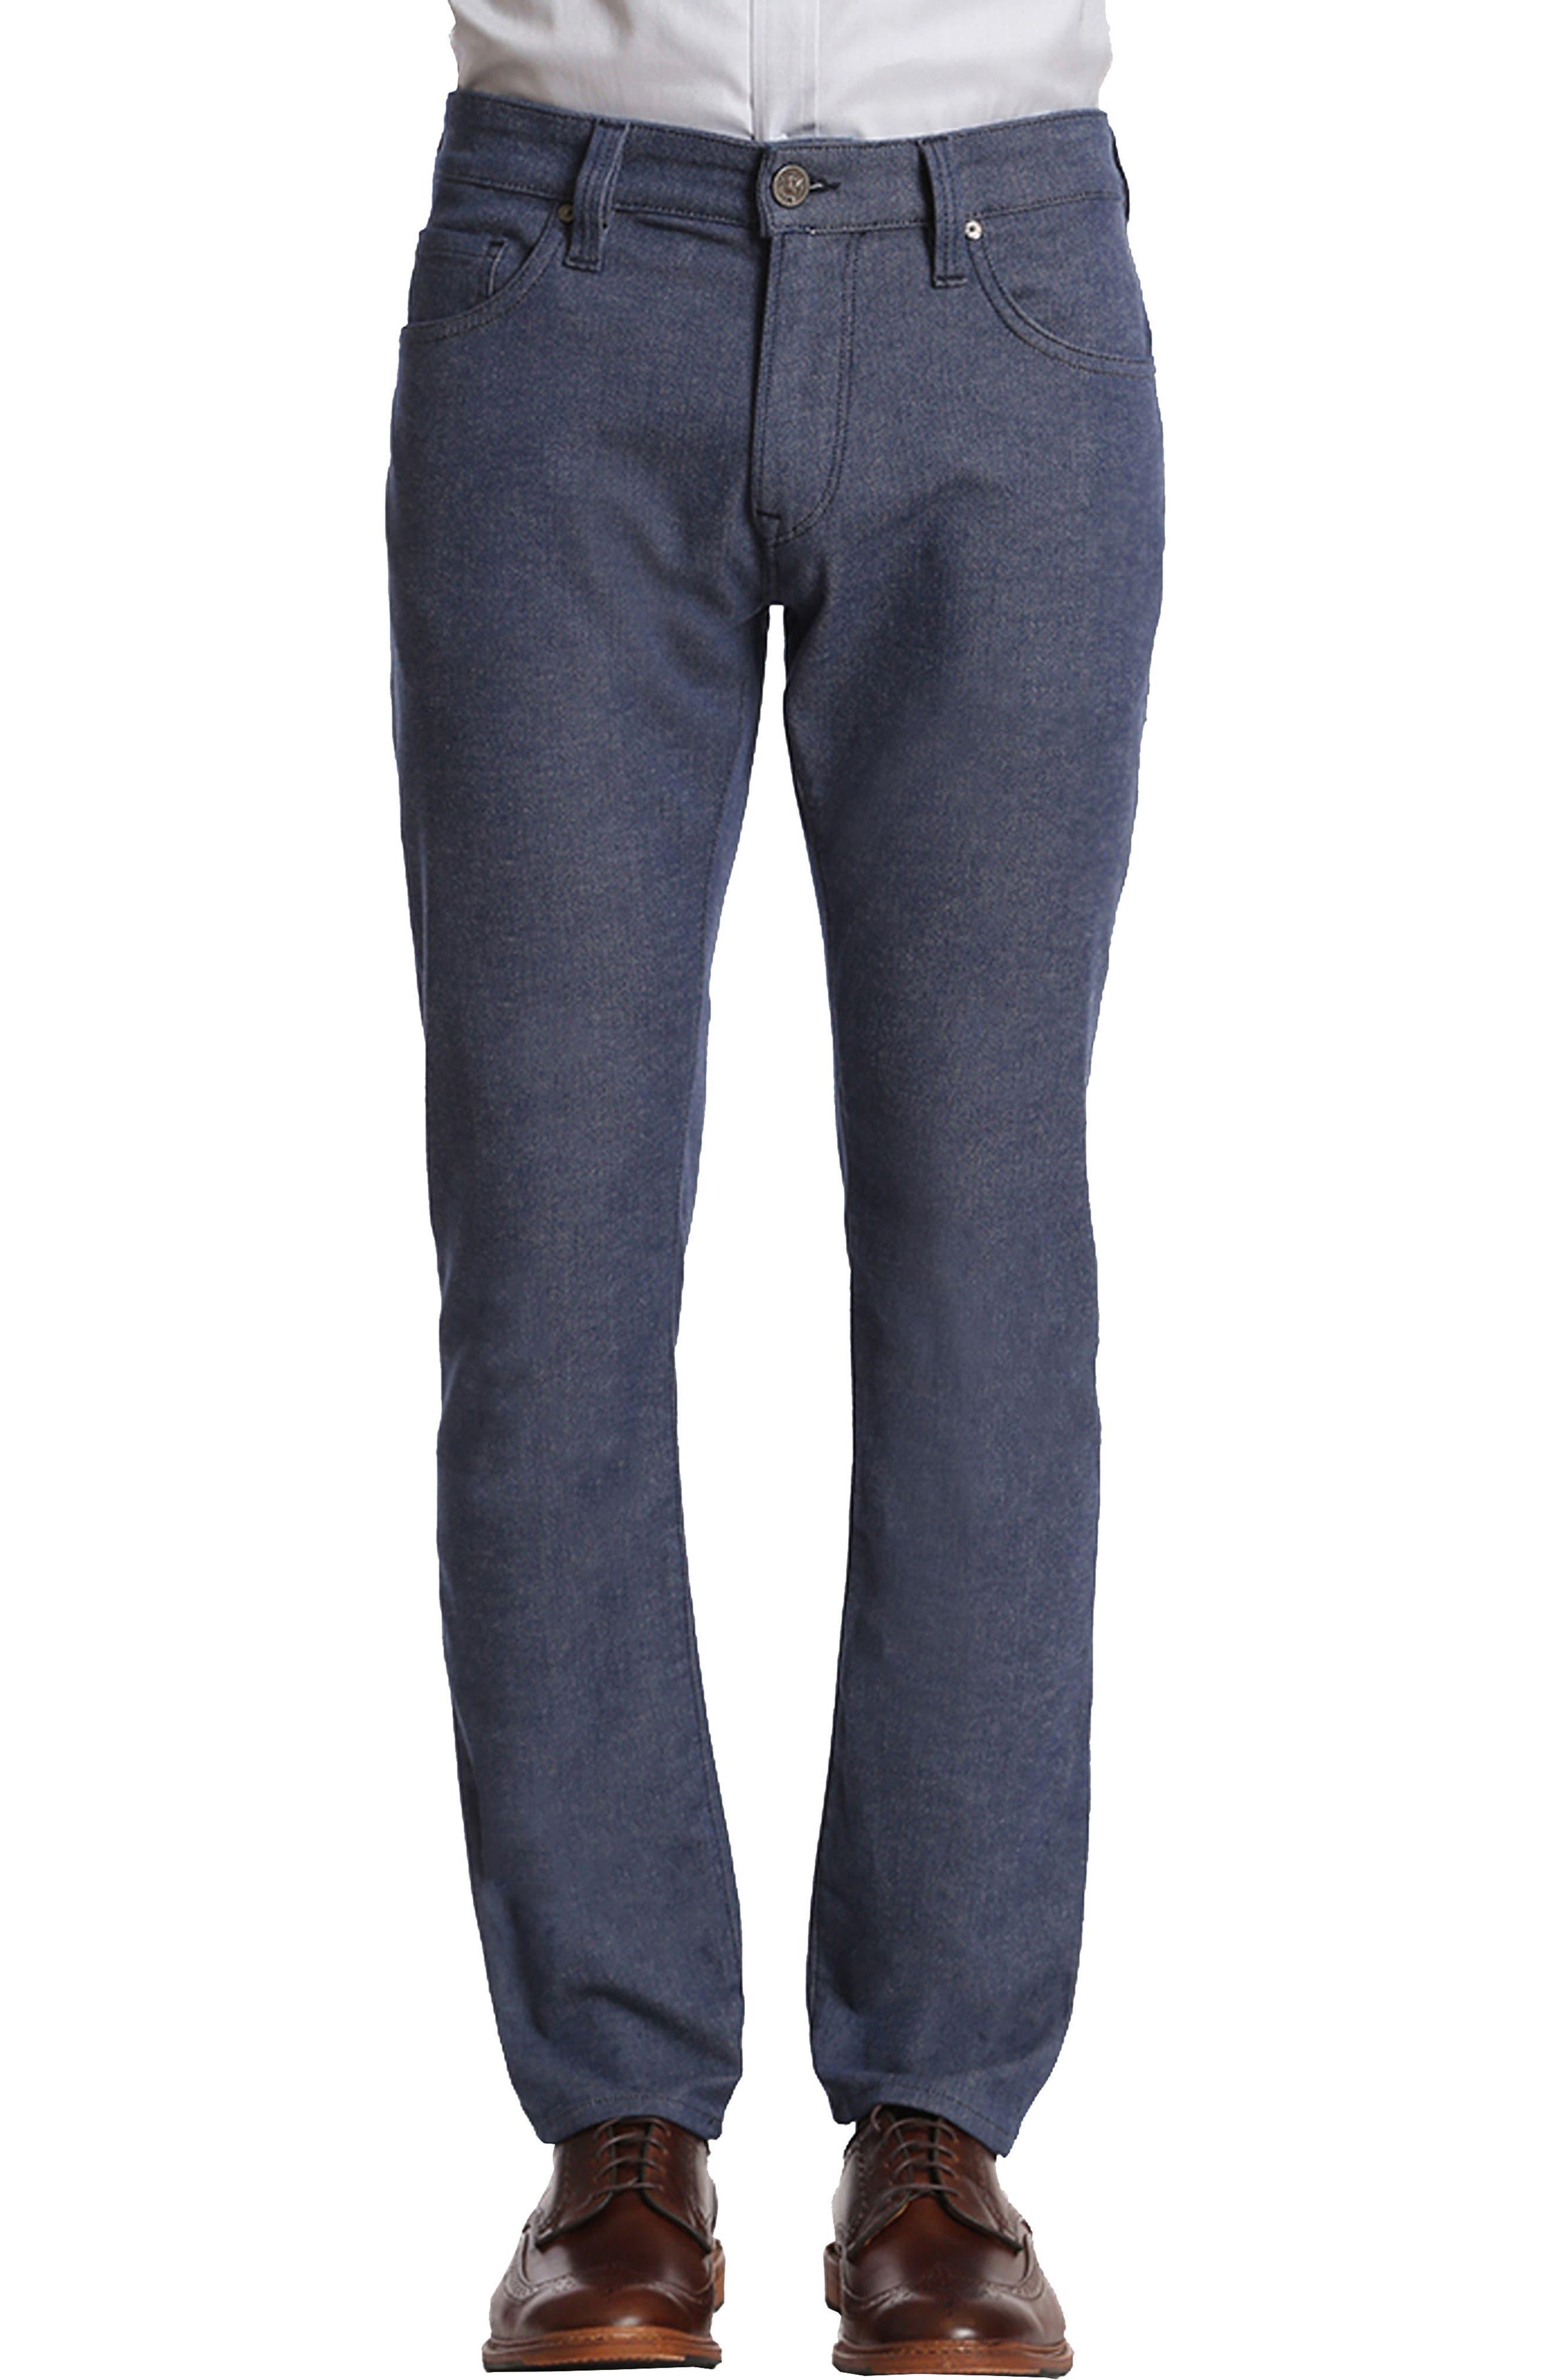 34 Heritage Charisma Relaxed Straight Leg Jeans (Indigo Winter Twill)